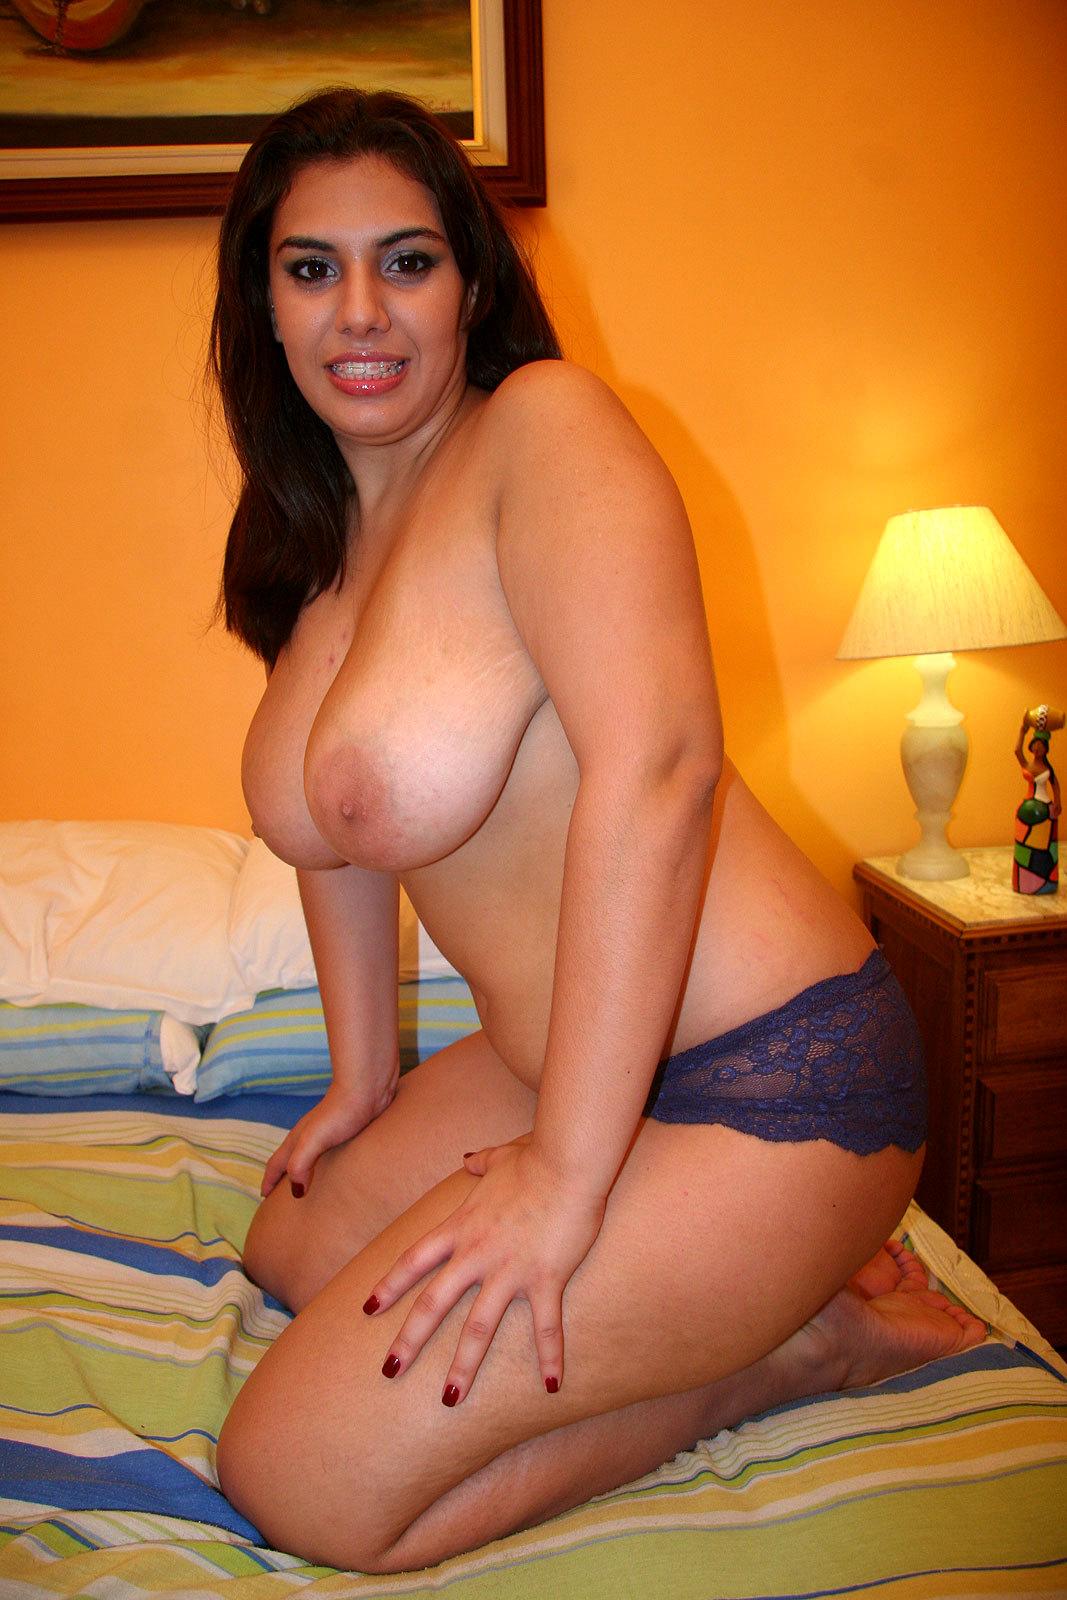 Ebony Transexual Thayssa Raika Destroys Busty Latina Babe